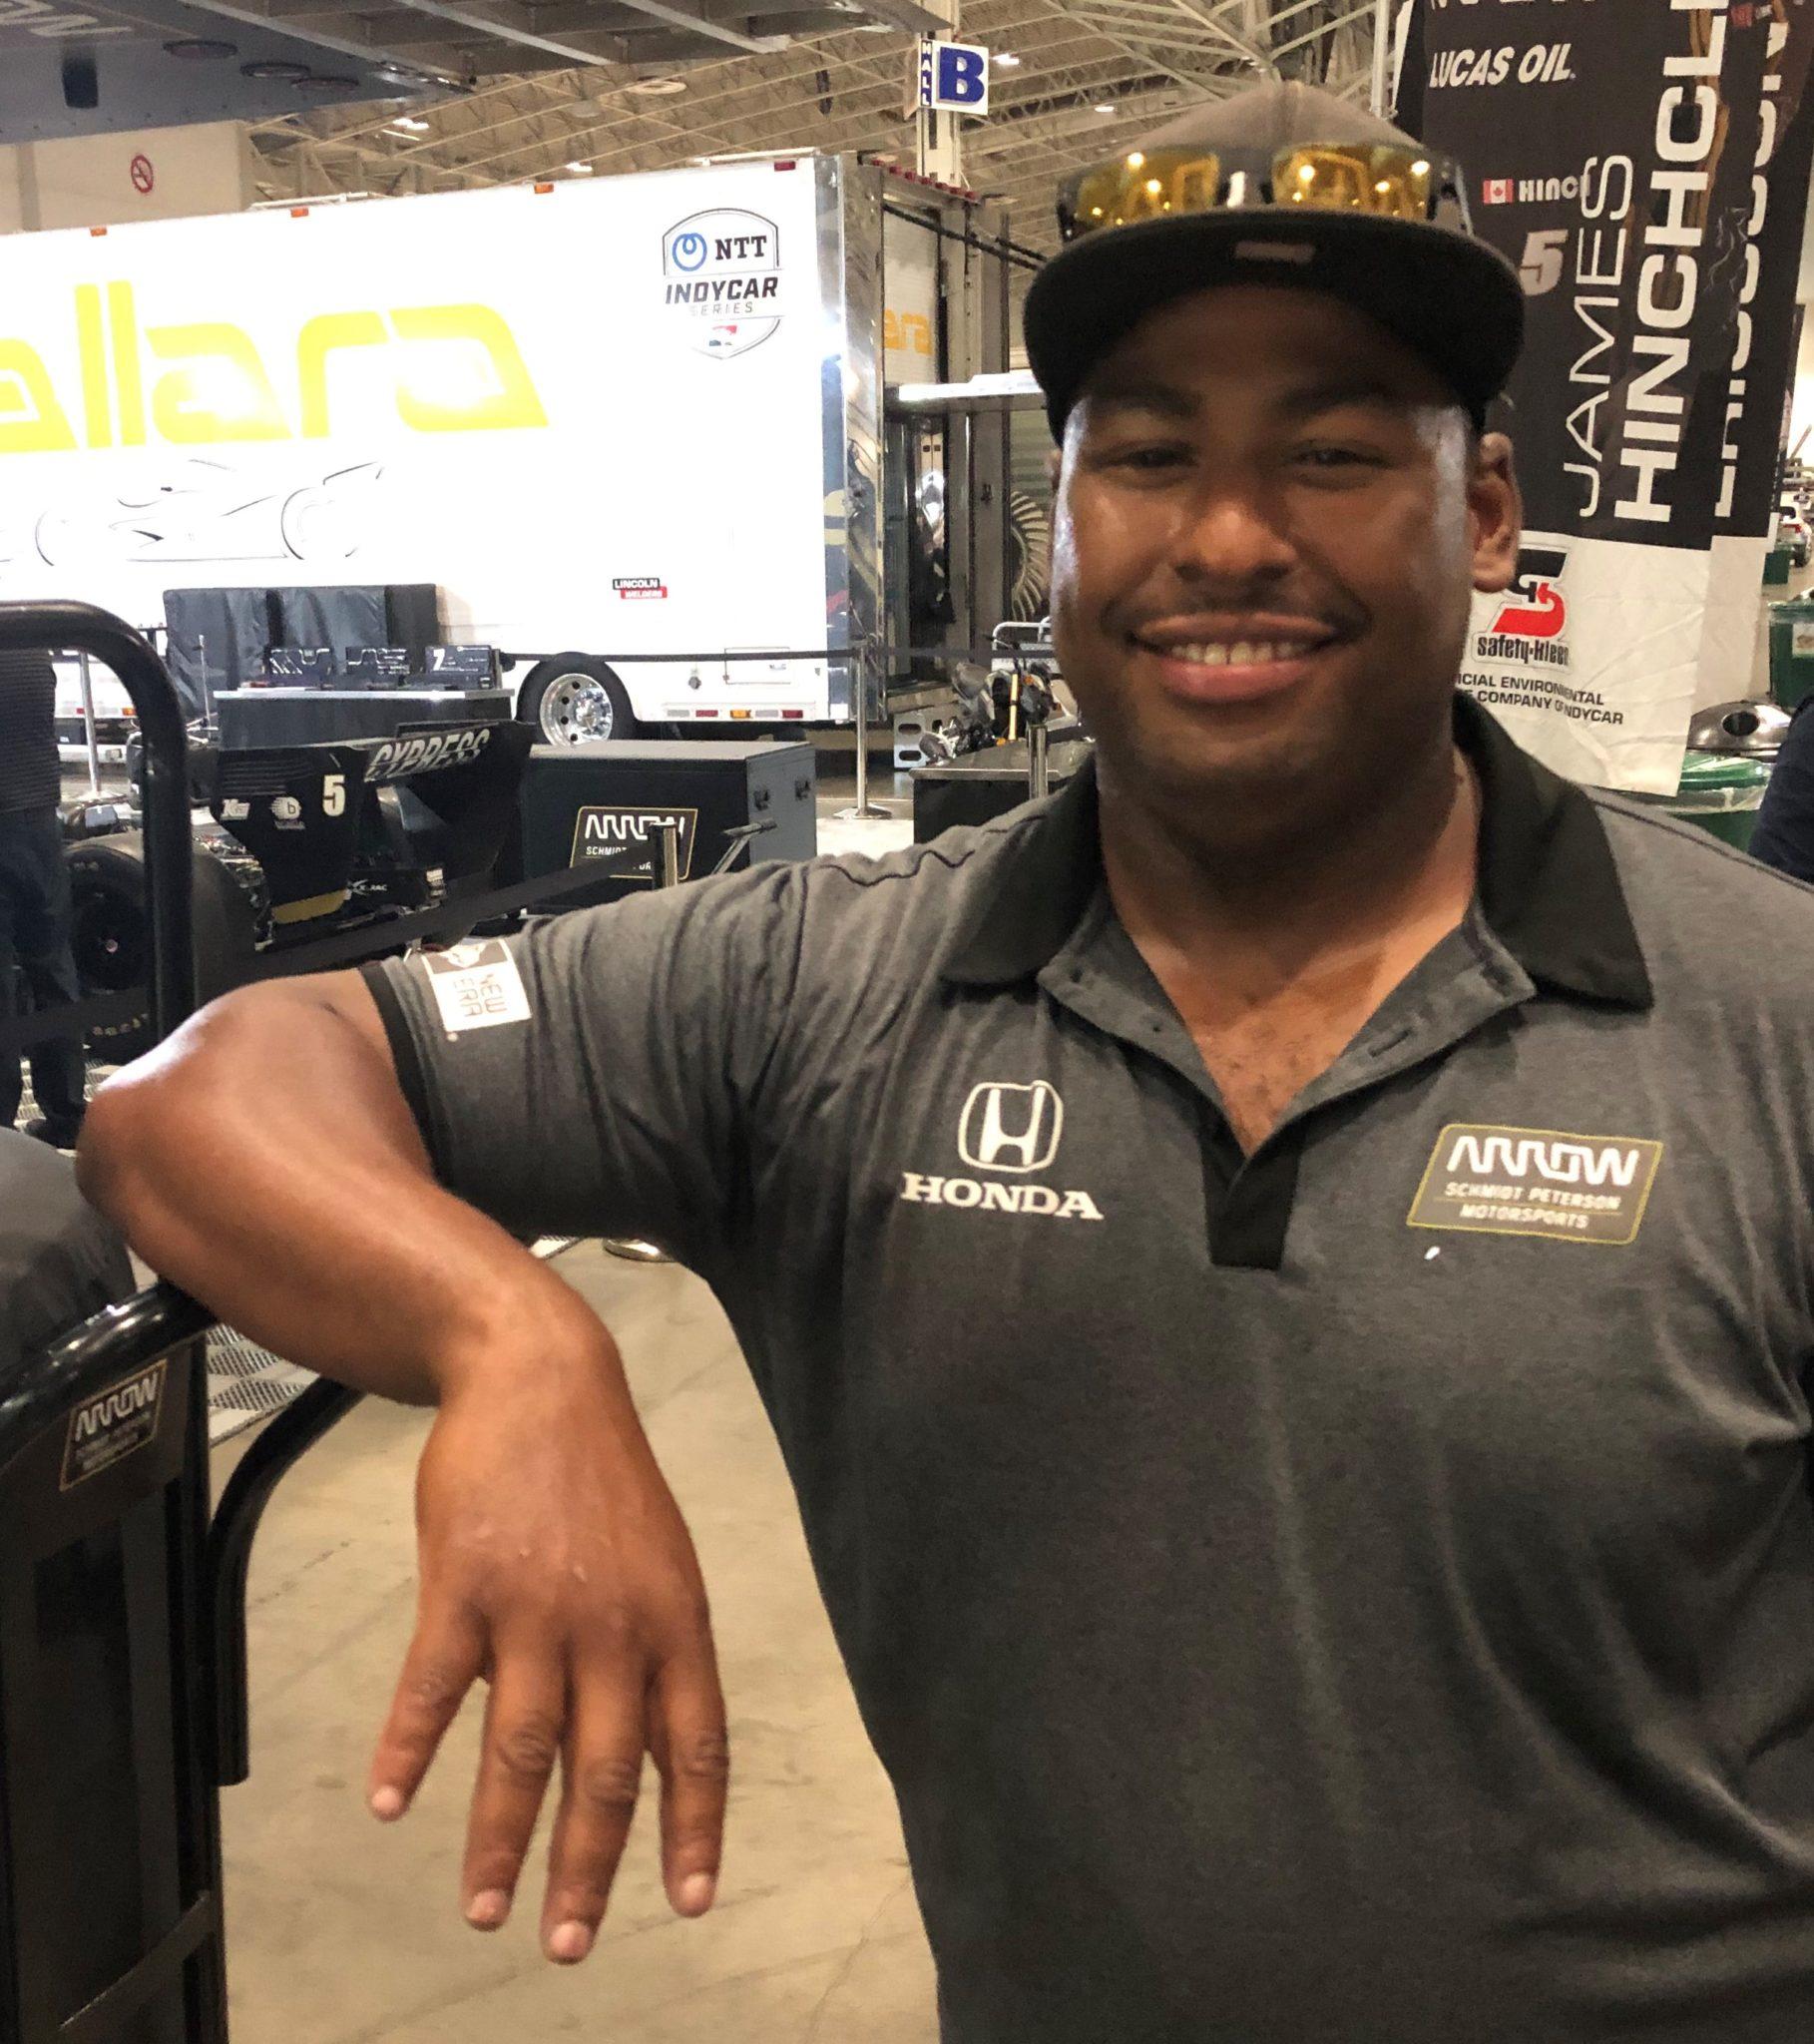 IndyCar truck driver Timothy Lane